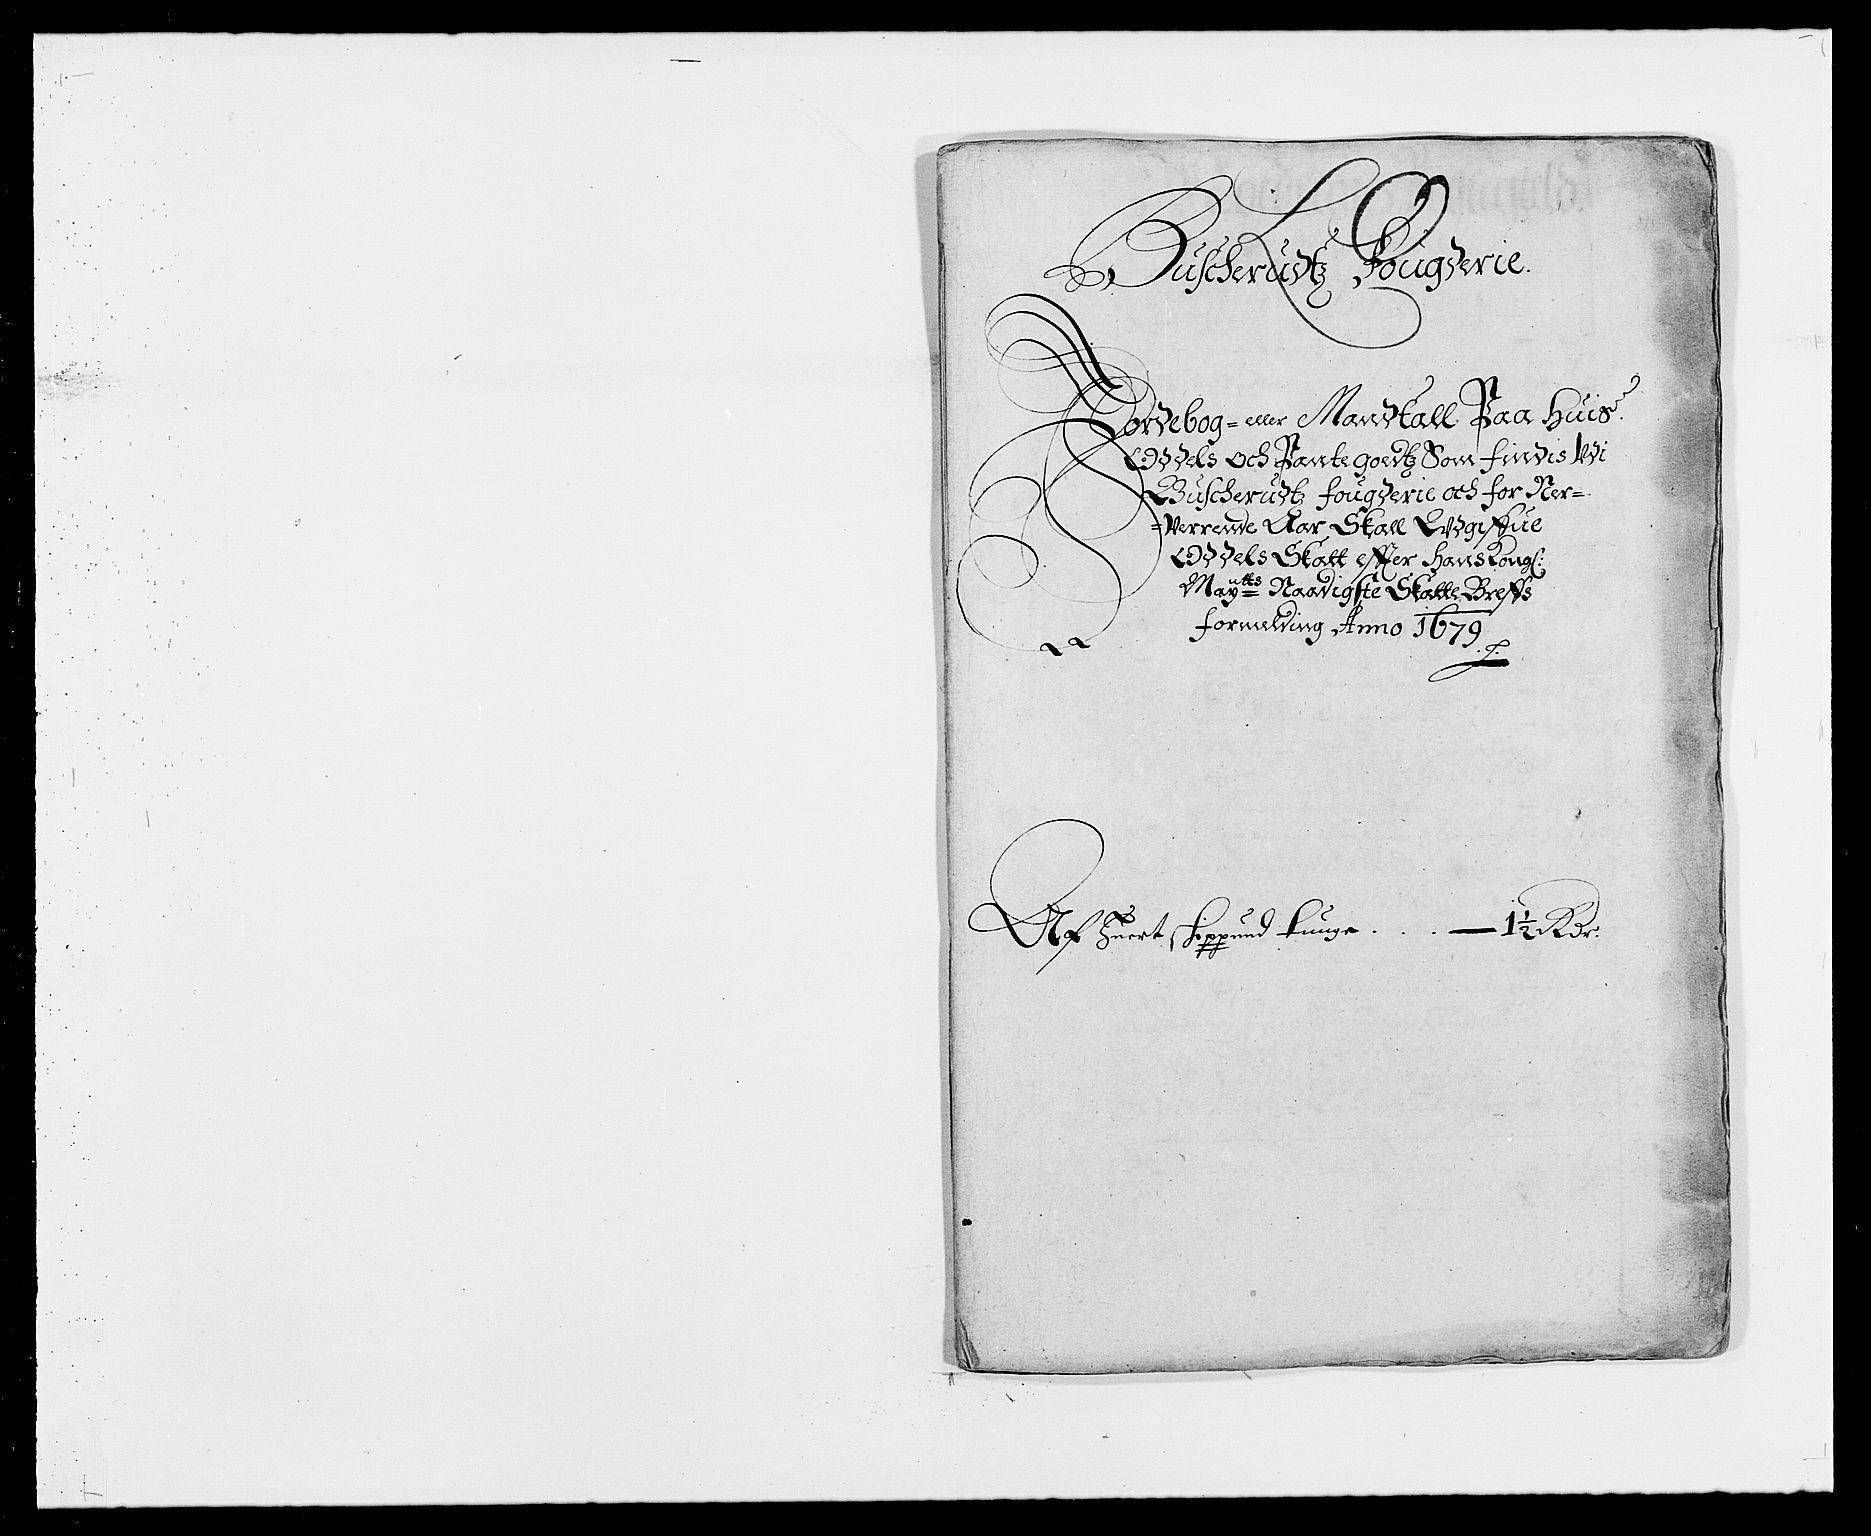 RA, Rentekammeret inntil 1814, Reviderte regnskaper, Fogderegnskap, R25/L1674: Fogderegnskap Buskerud, 1678-1681, s. 307